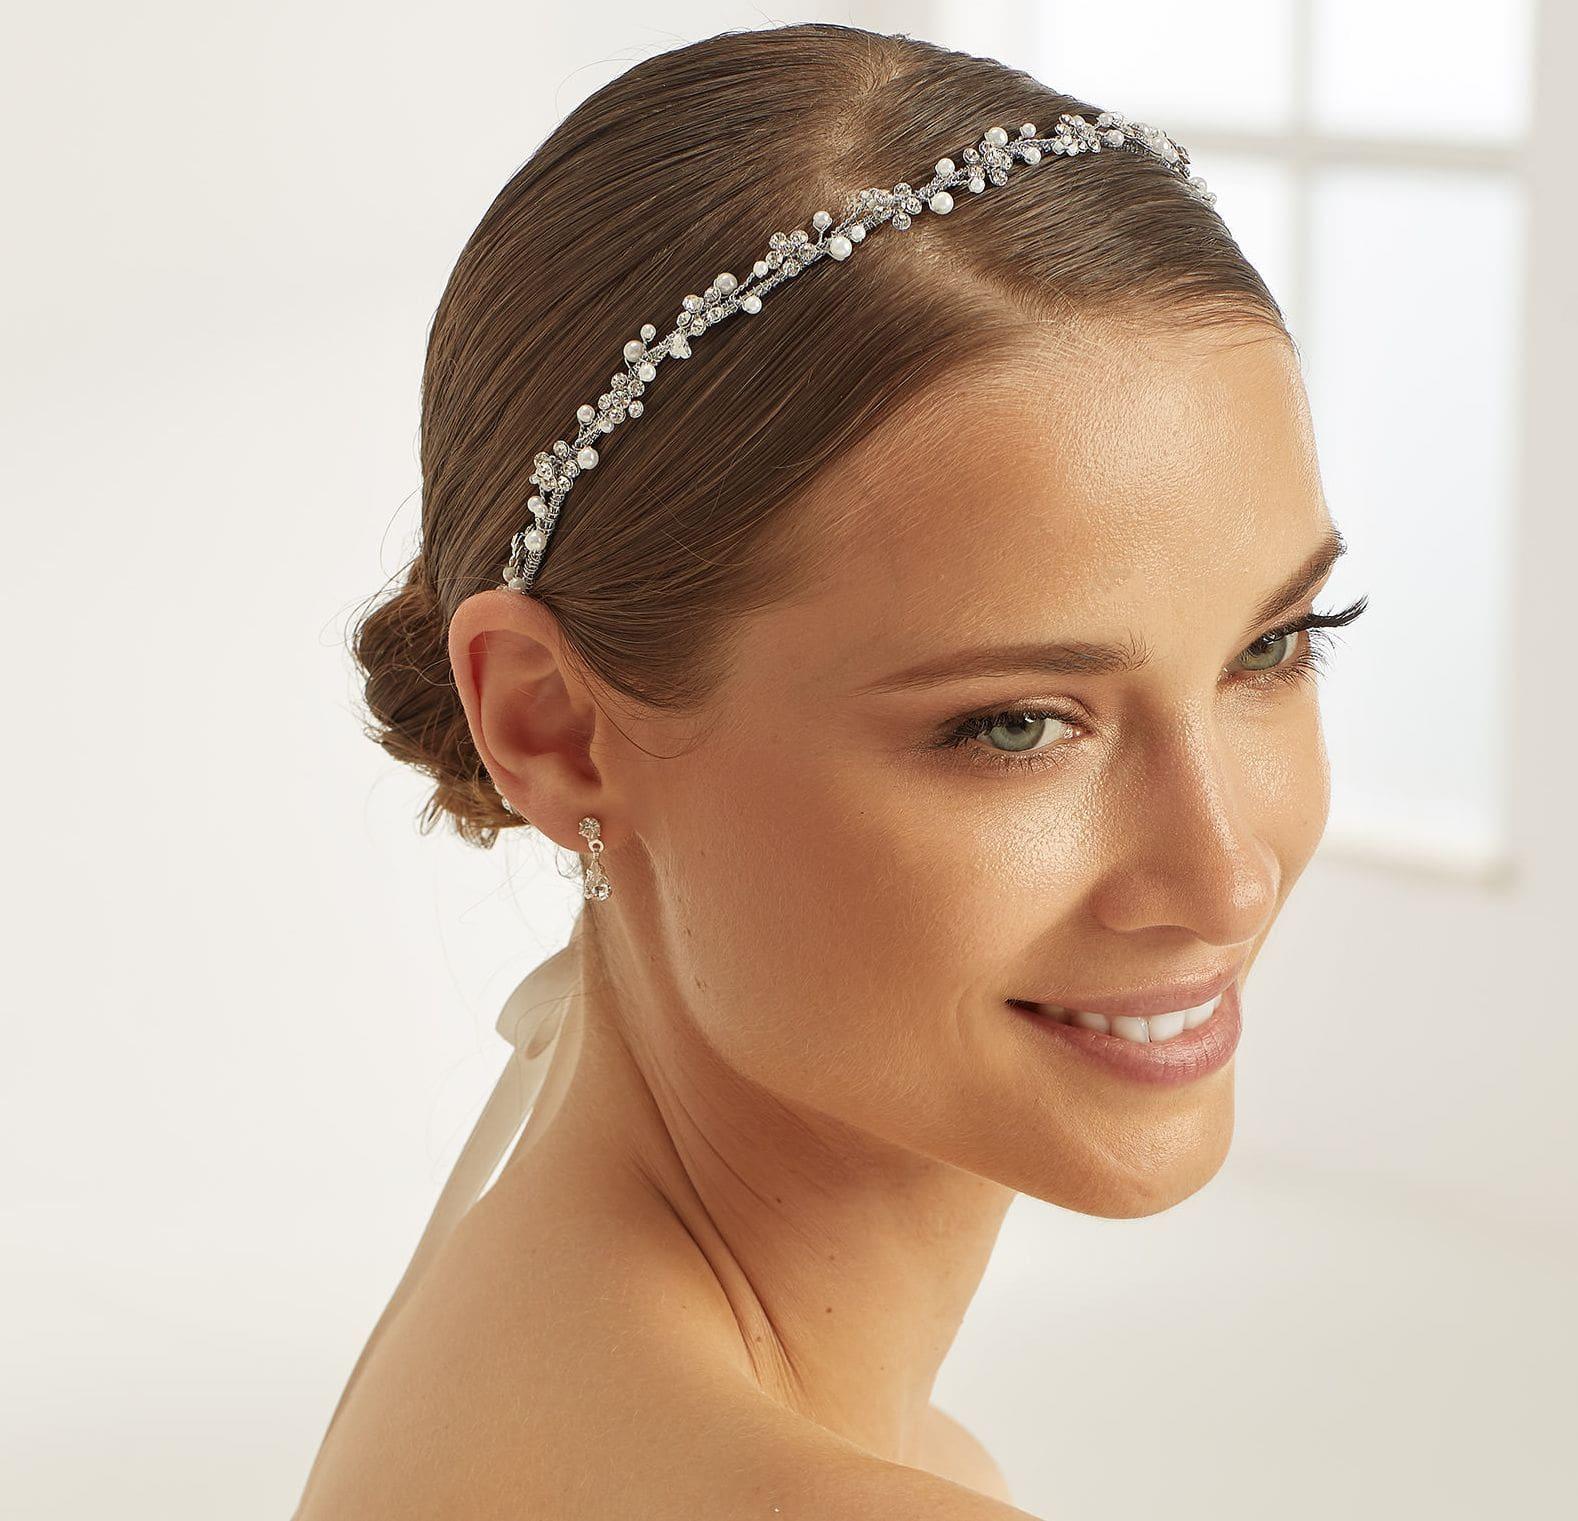 Haarband No. 468